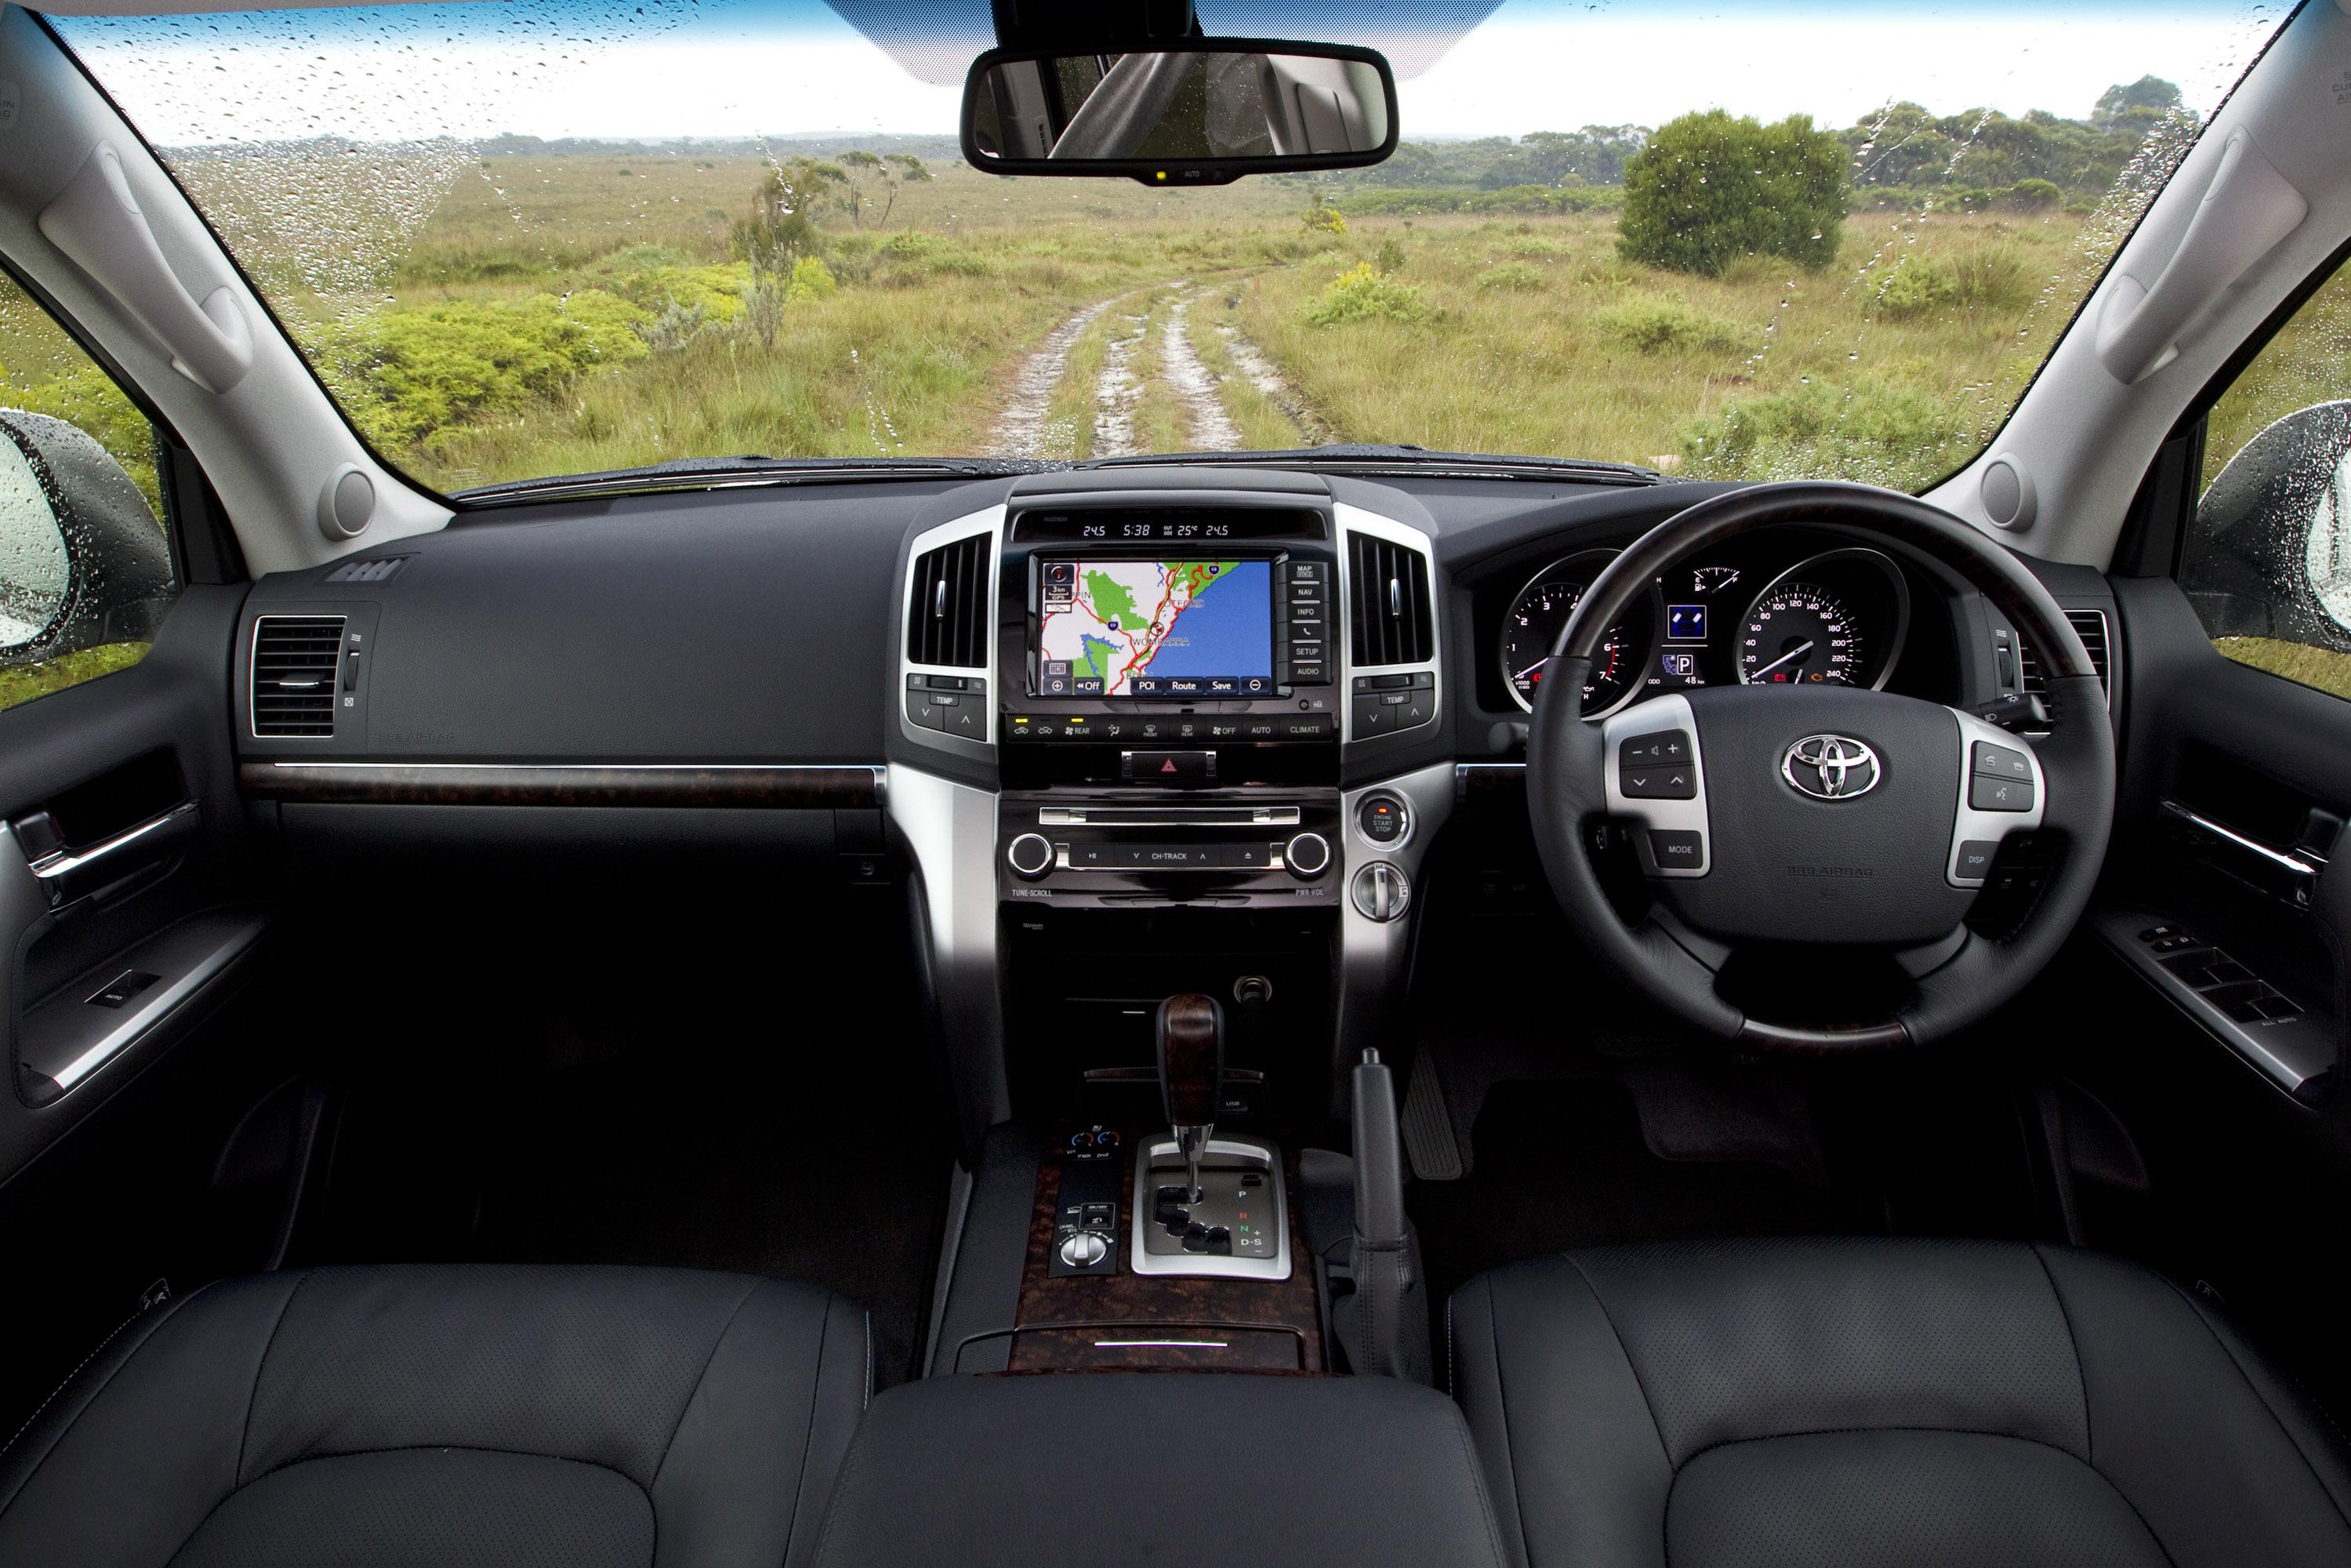 Toyota Prado 2018 Review >> 2012 Toyota LandCruiser 200 with new 4.6 liter V8 engine